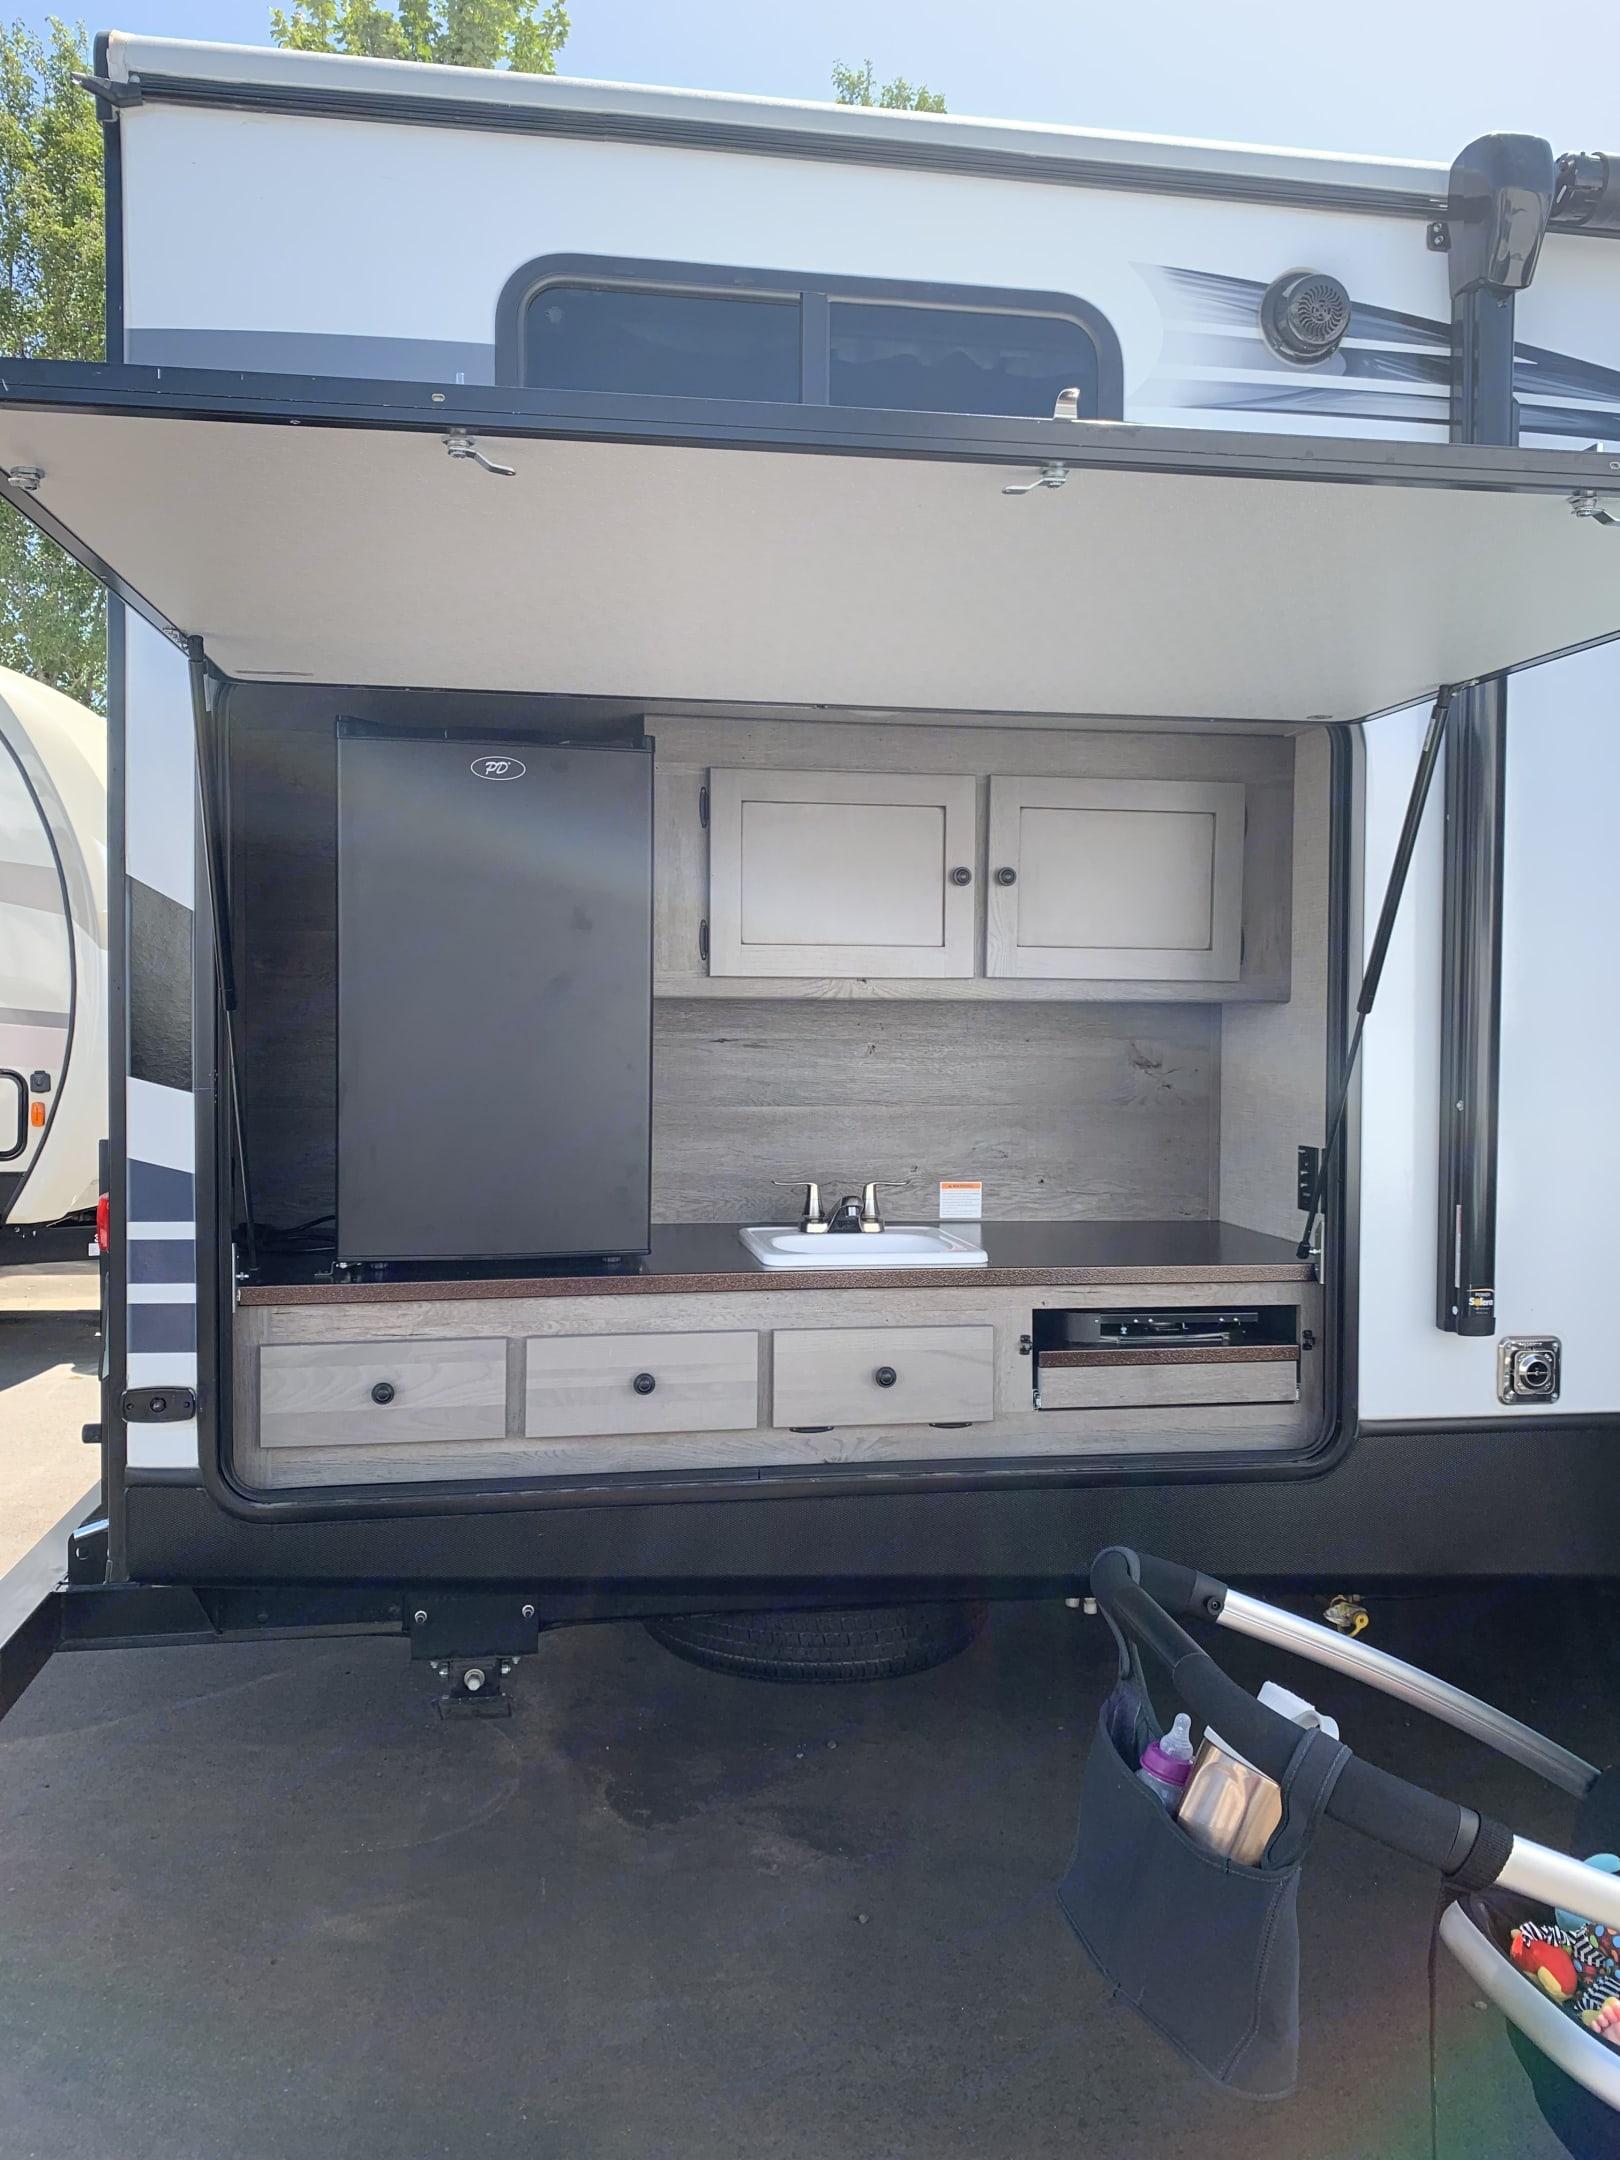 Outside Kitchen, fridge, sink and 2 burner stove, TV hook ups. Keystone Outback Terrain 2020